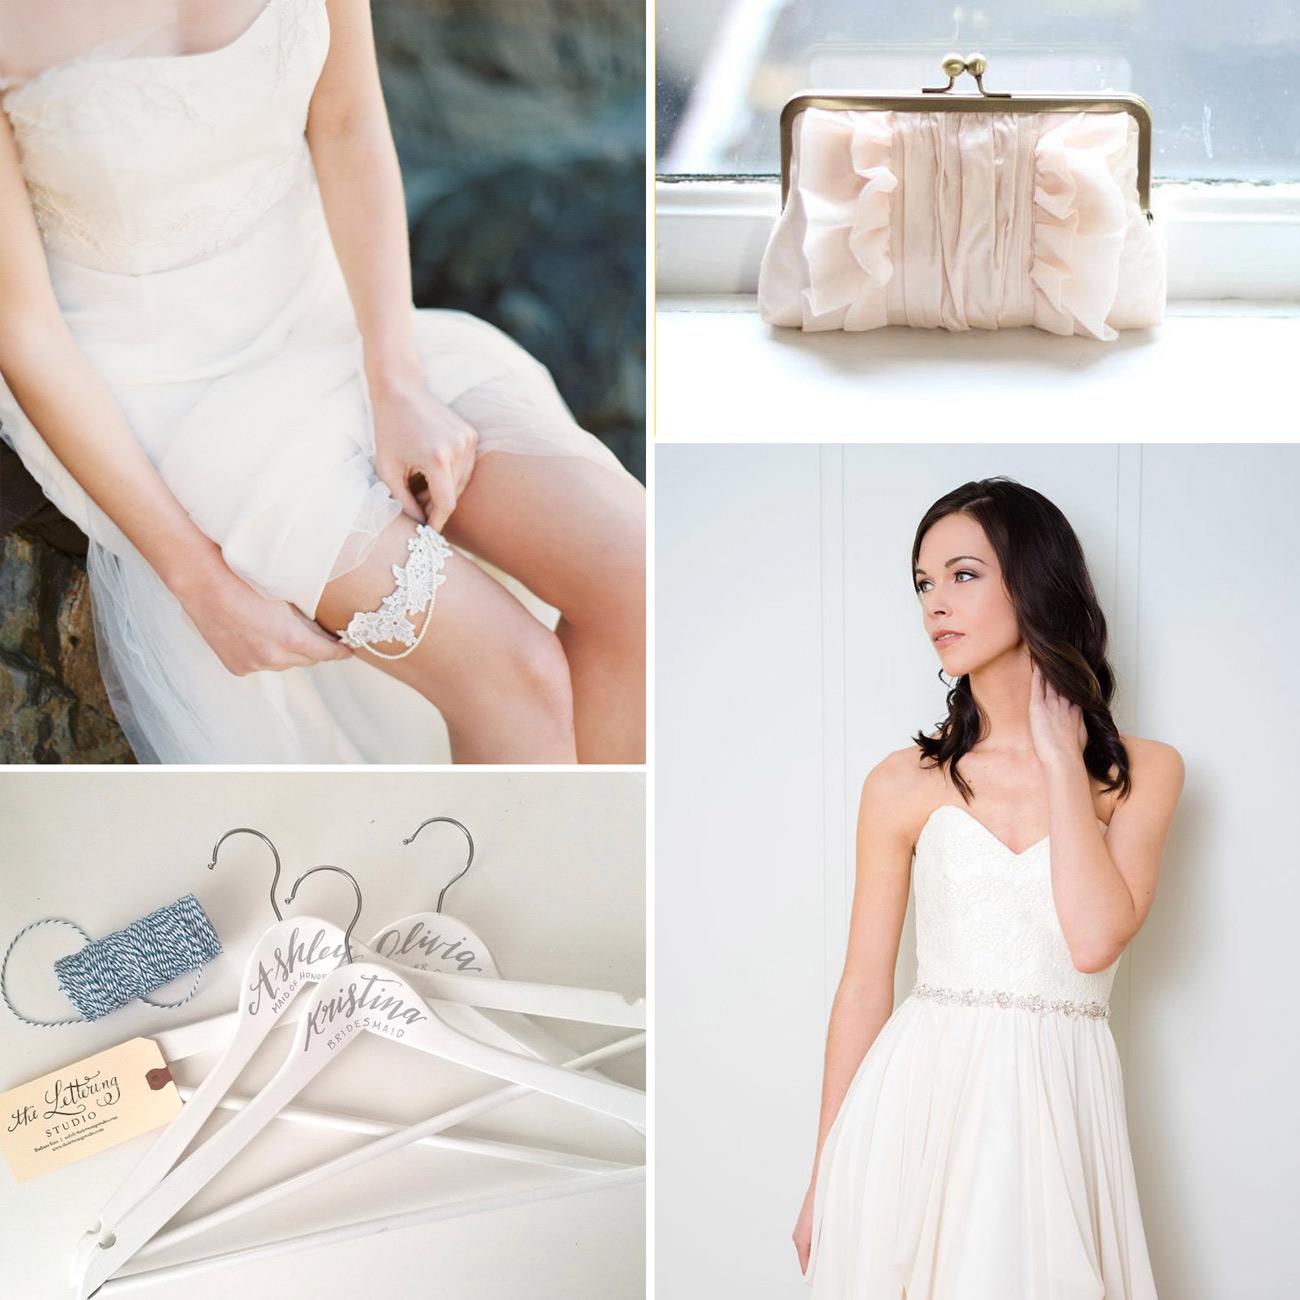 Etsy Canada Wedding Dress Hangers, Clutch, Sashes